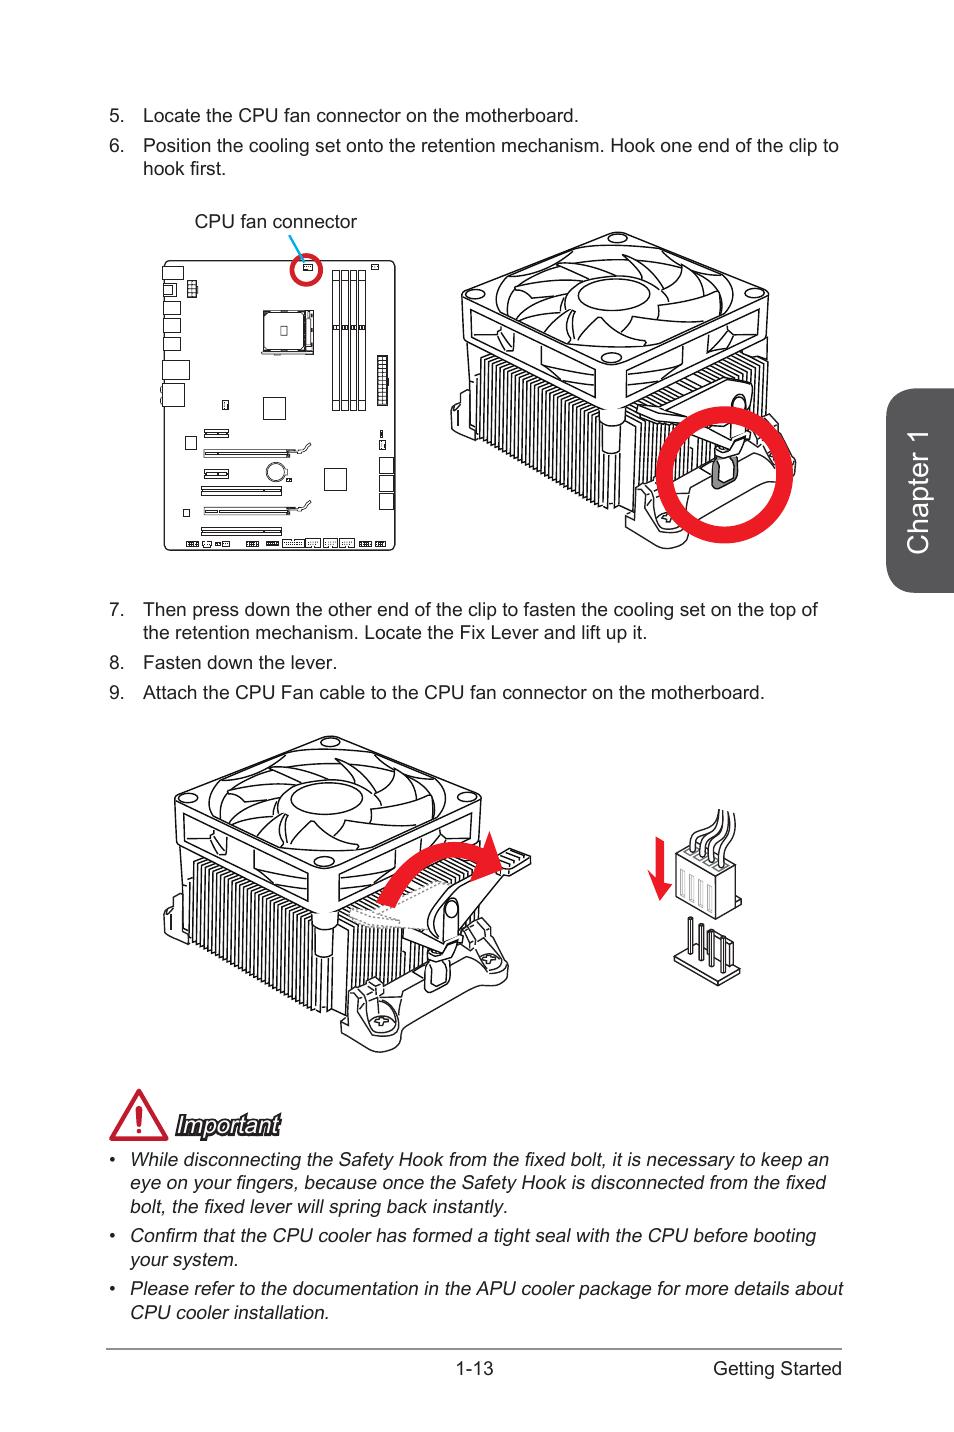 msi 970 gaming mainboard manual